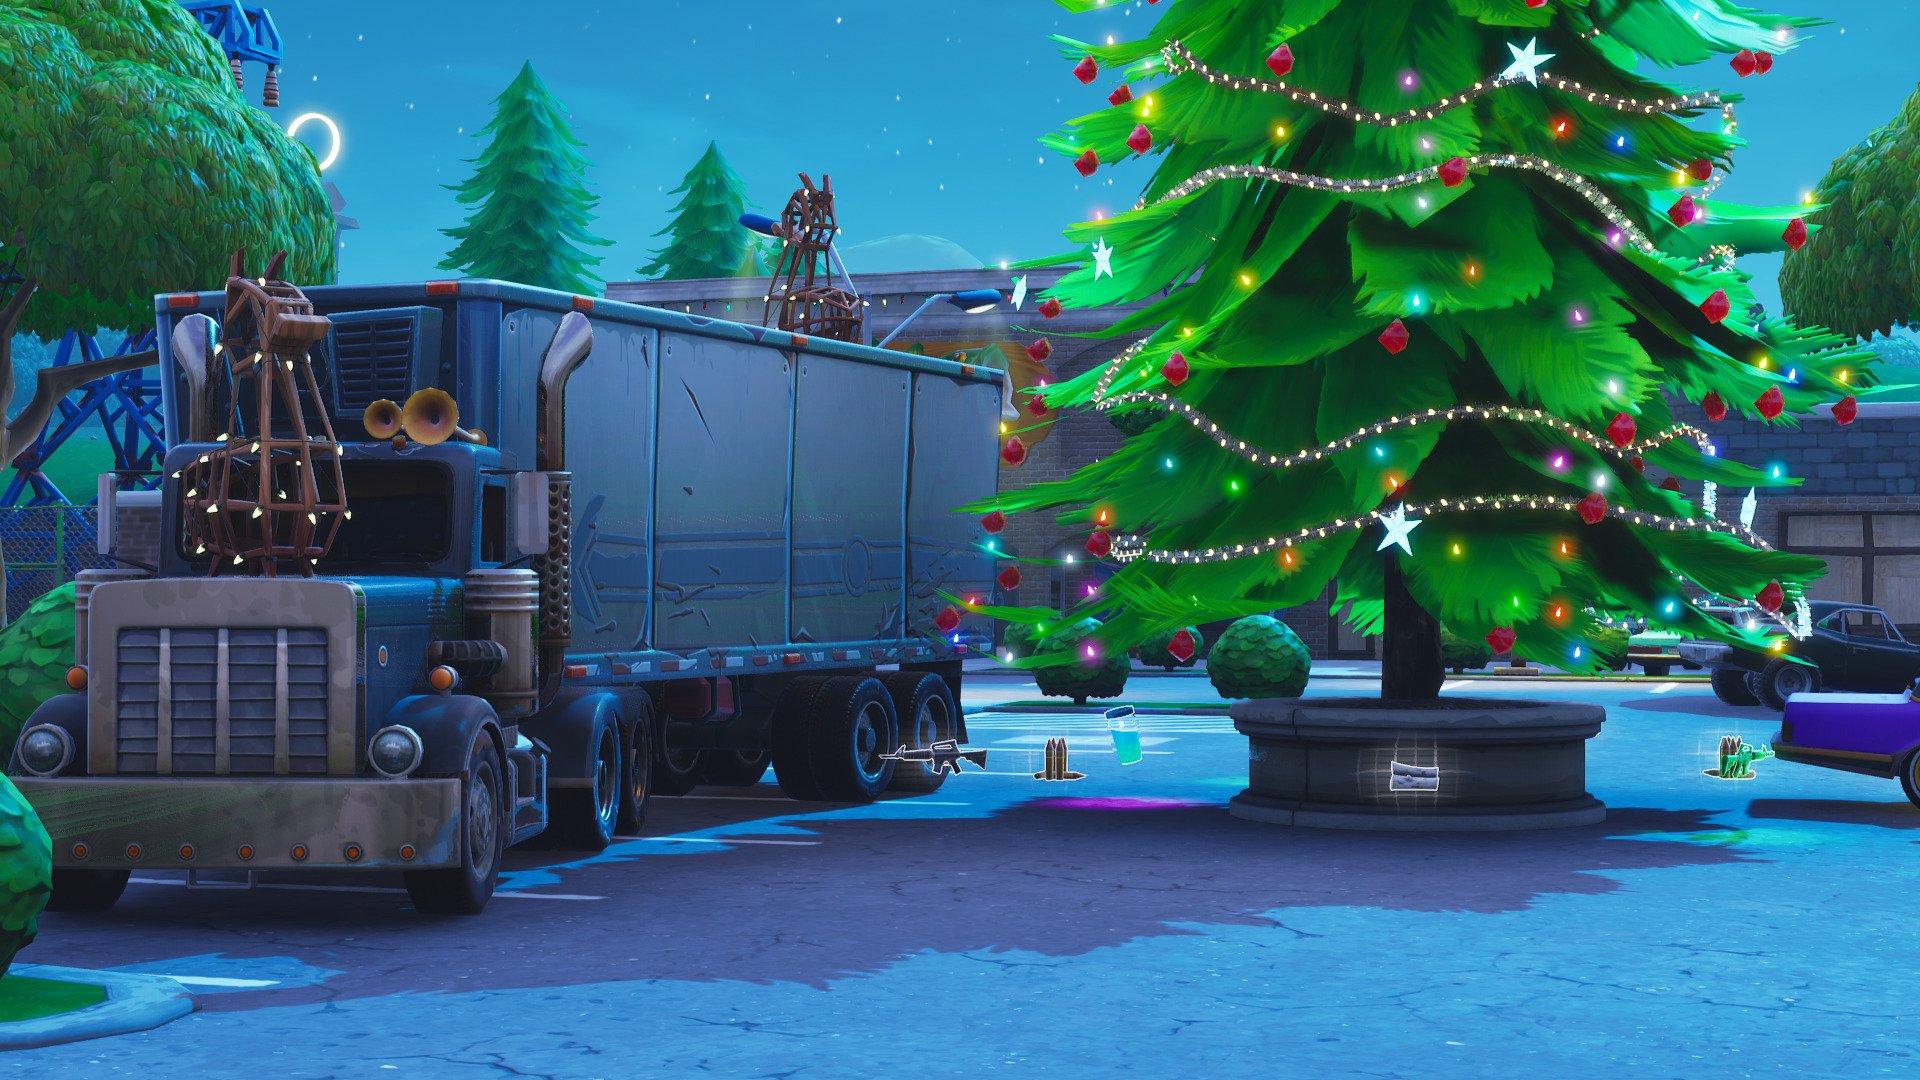 Fortnite Christmas Tree Background.Fortnite News On Twitter Christmas Trees Have Returned And